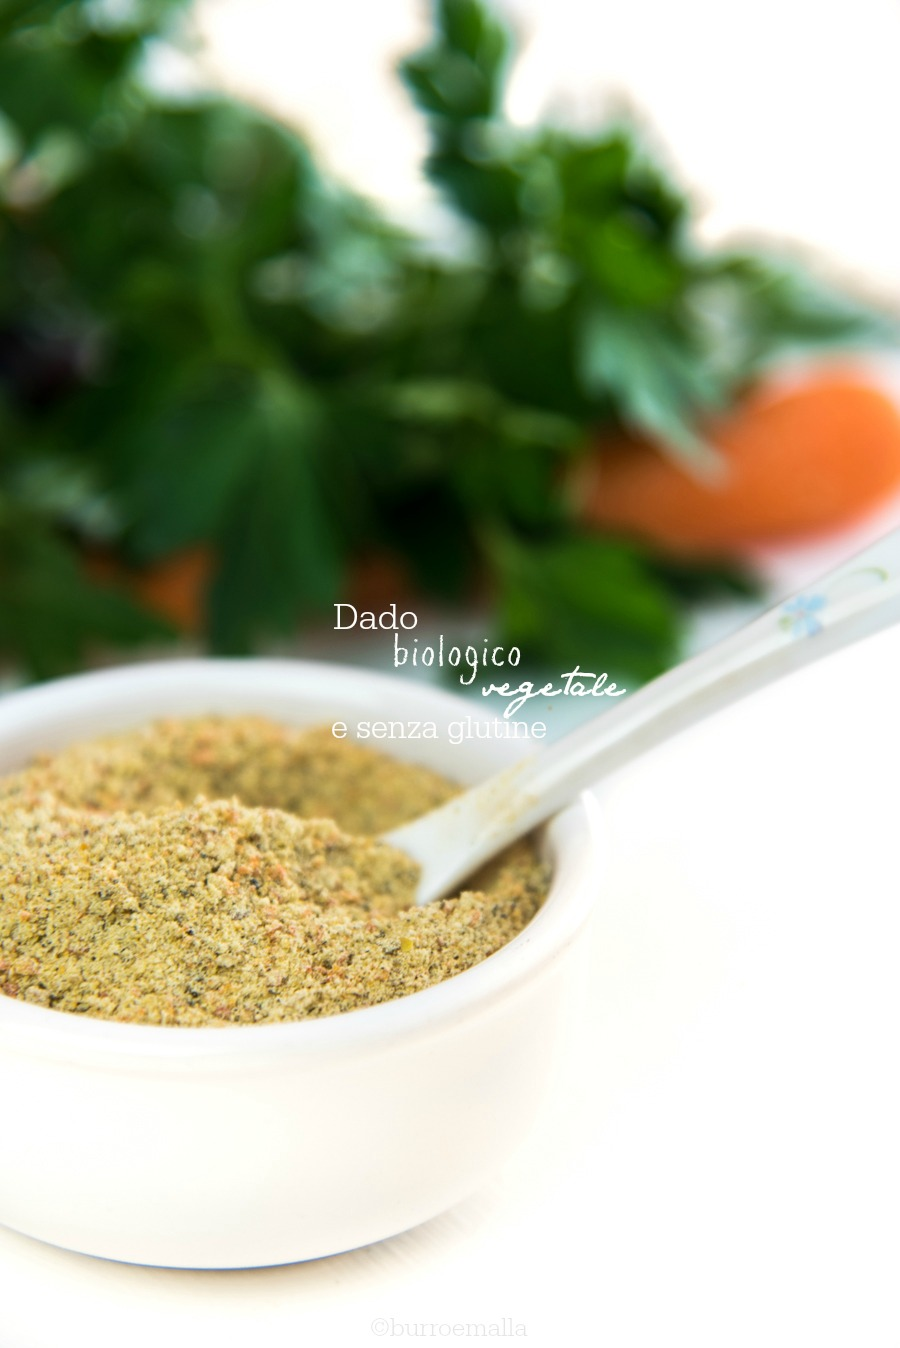 dado vegetale granulare biologico e senza glutine